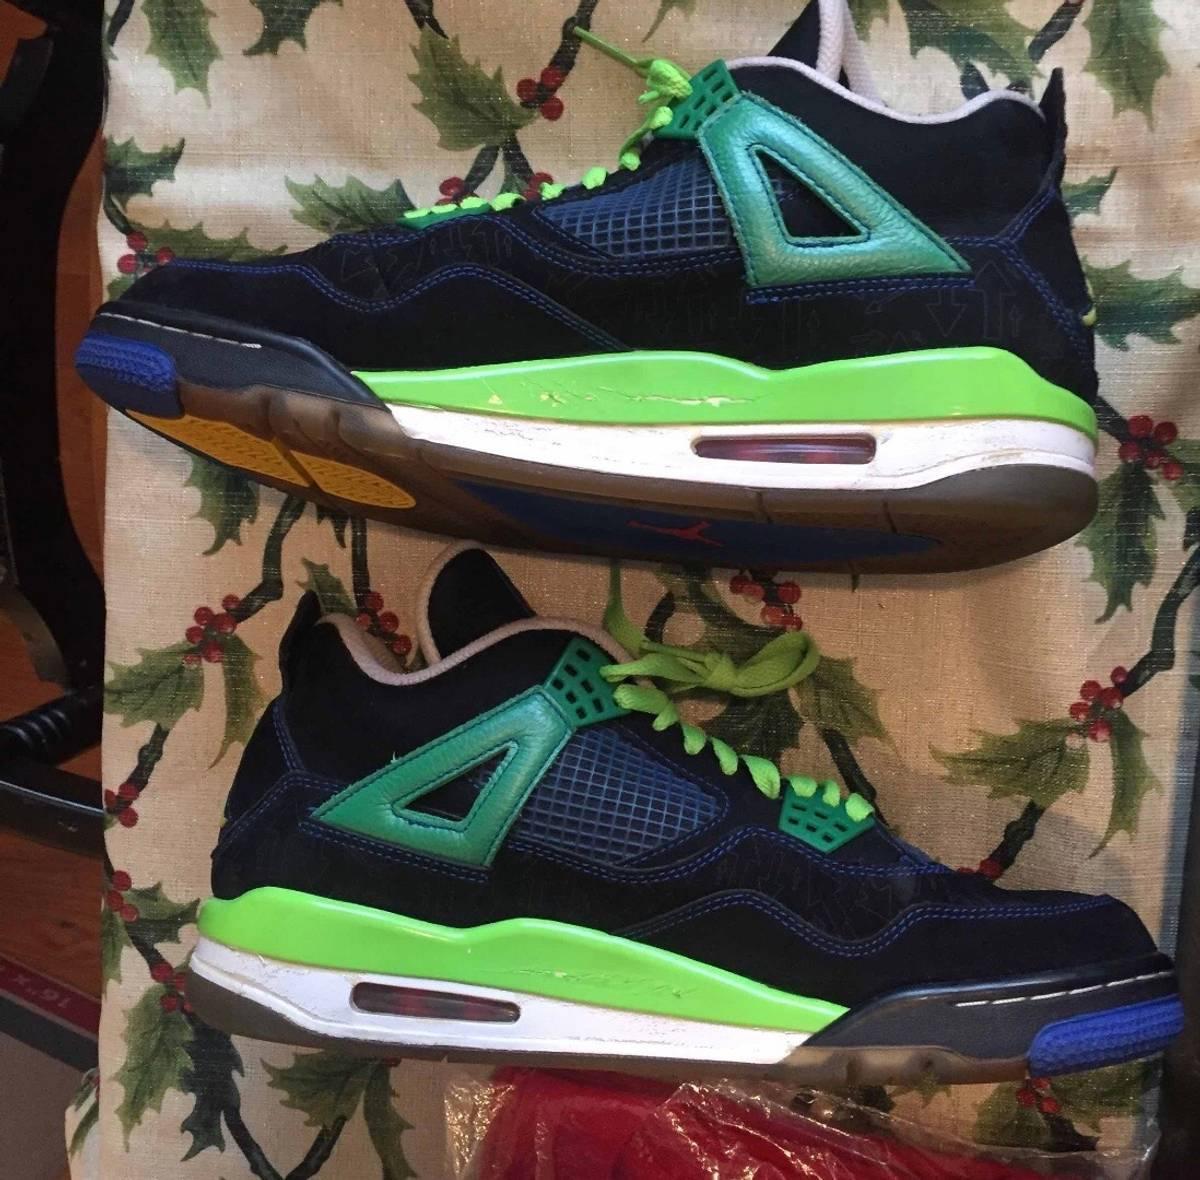 932973e92c0a Jordan Brand Doernbecher 4s Size 10 - Hi-Top Sneakers for Sale - Grailed